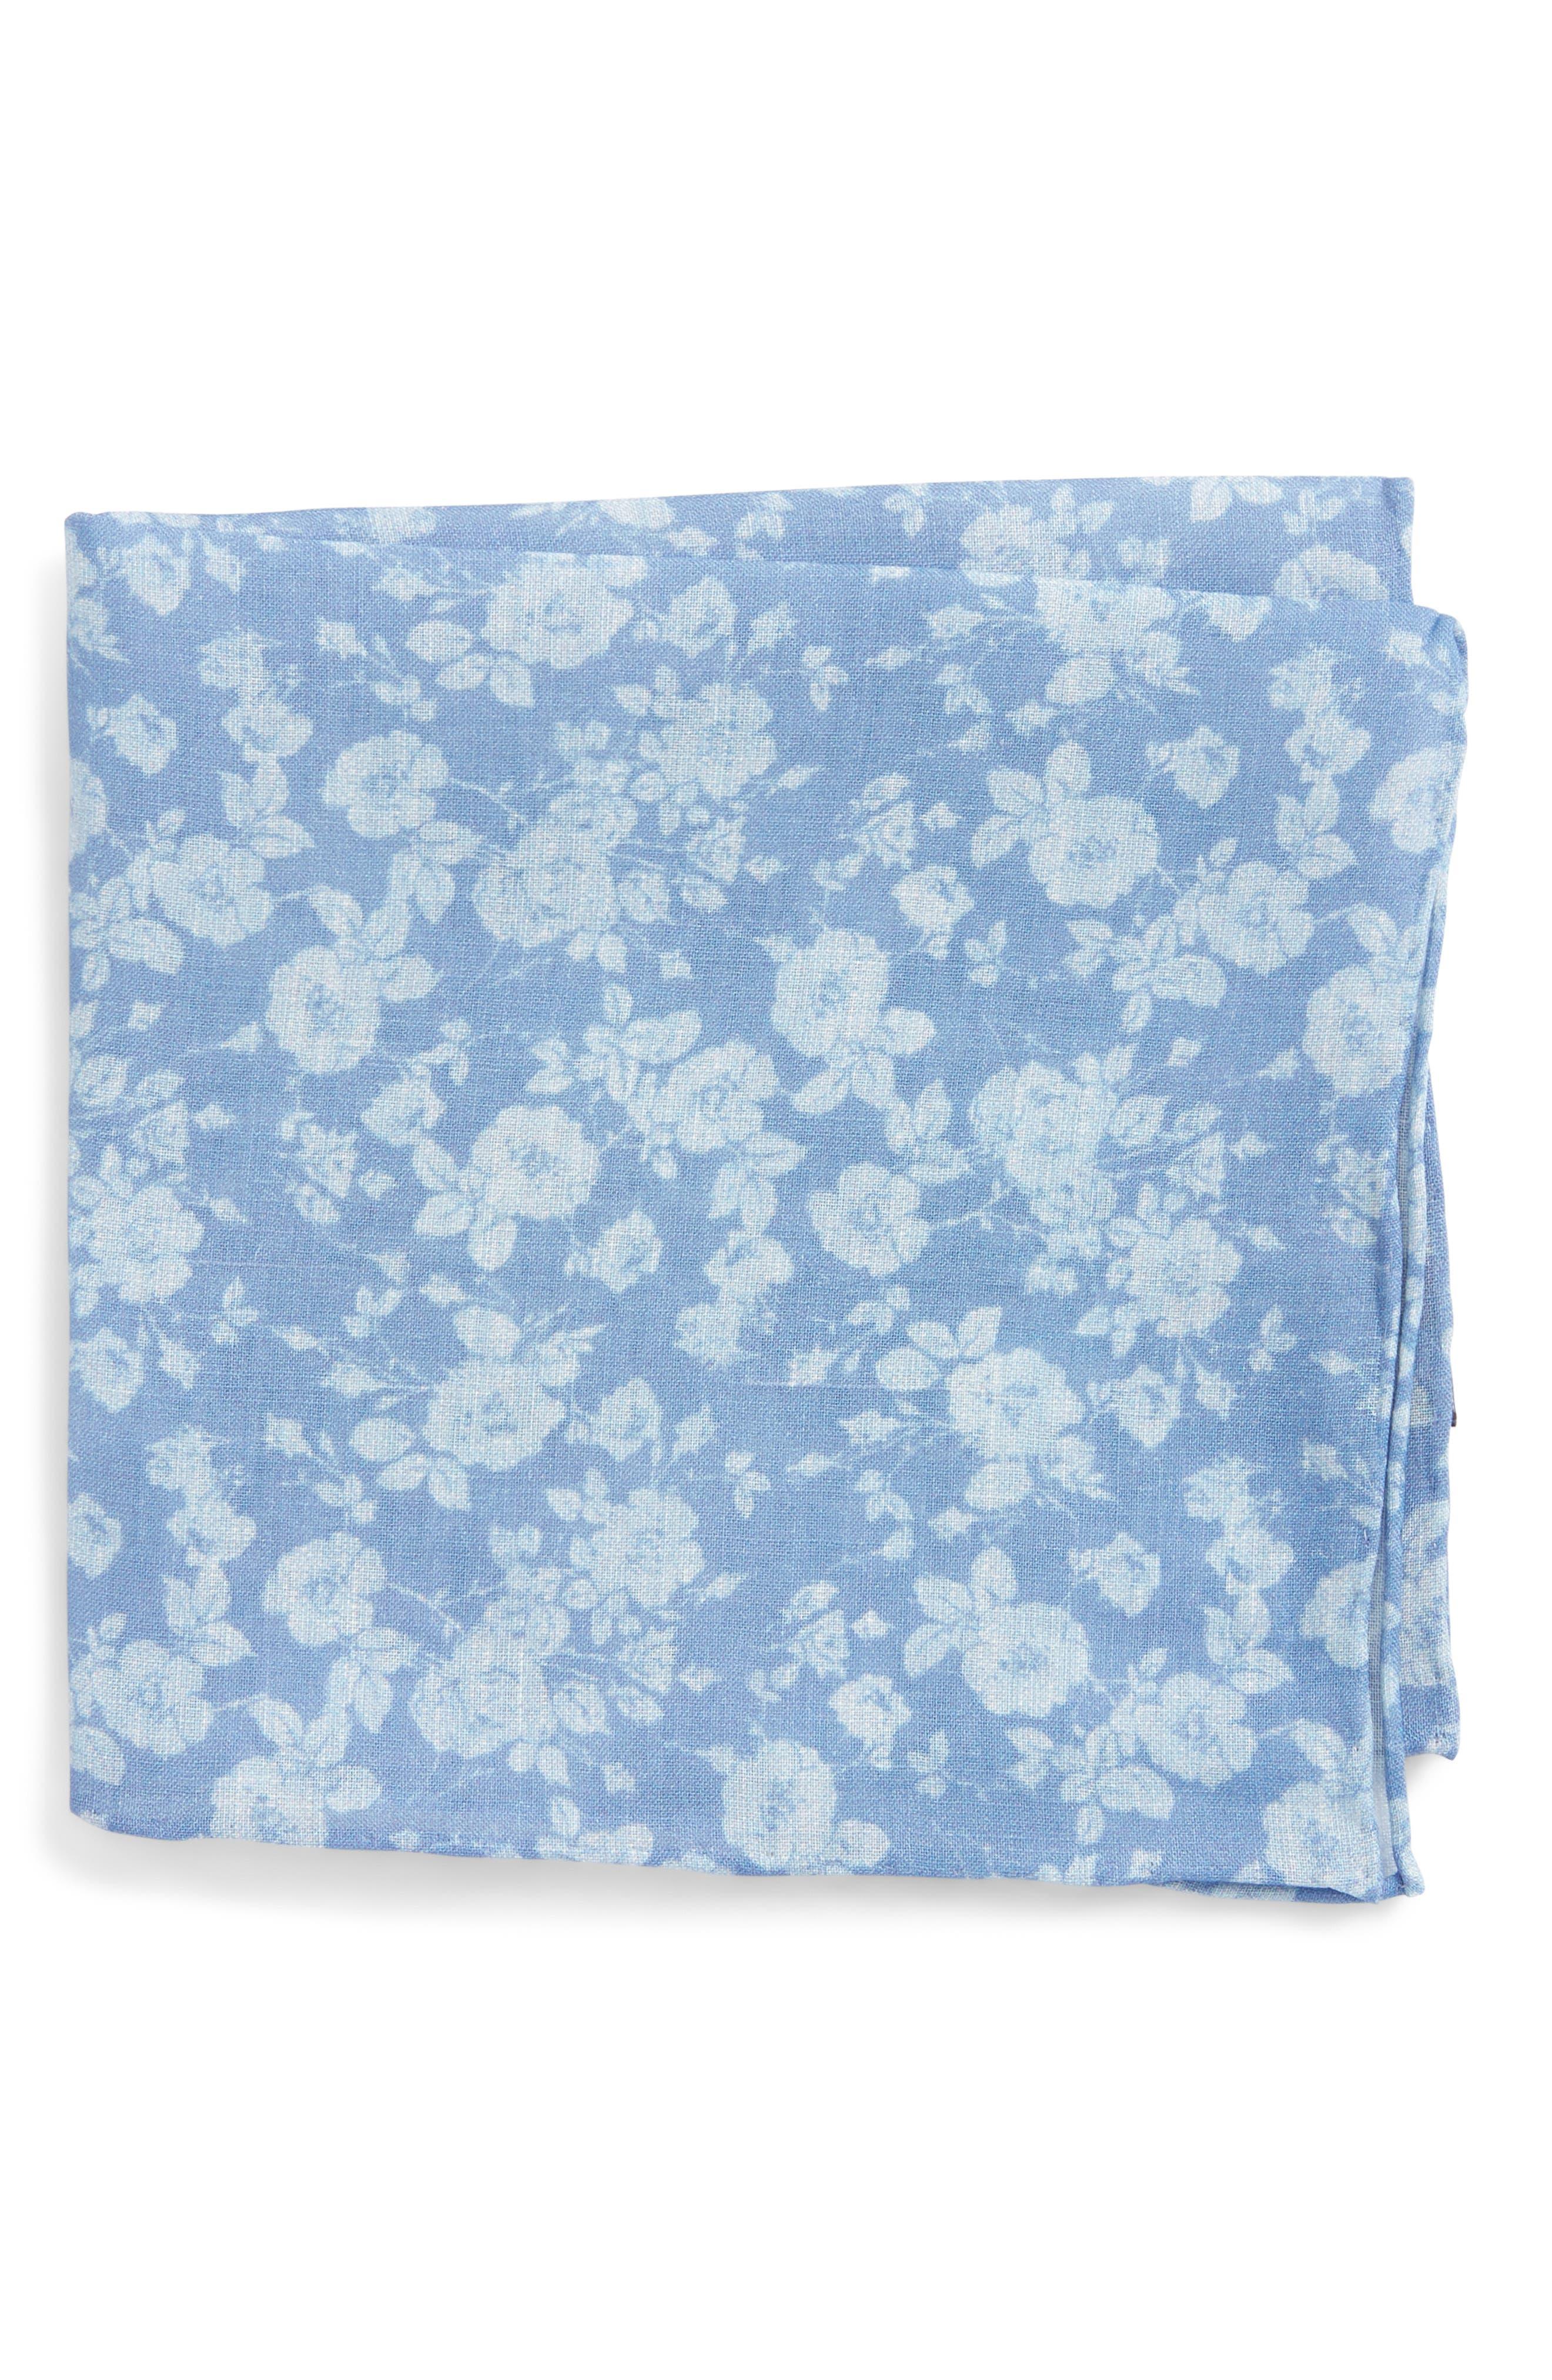 Buds Floral Linen Pocket Square,                             Main thumbnail 1, color,                             Light Blue